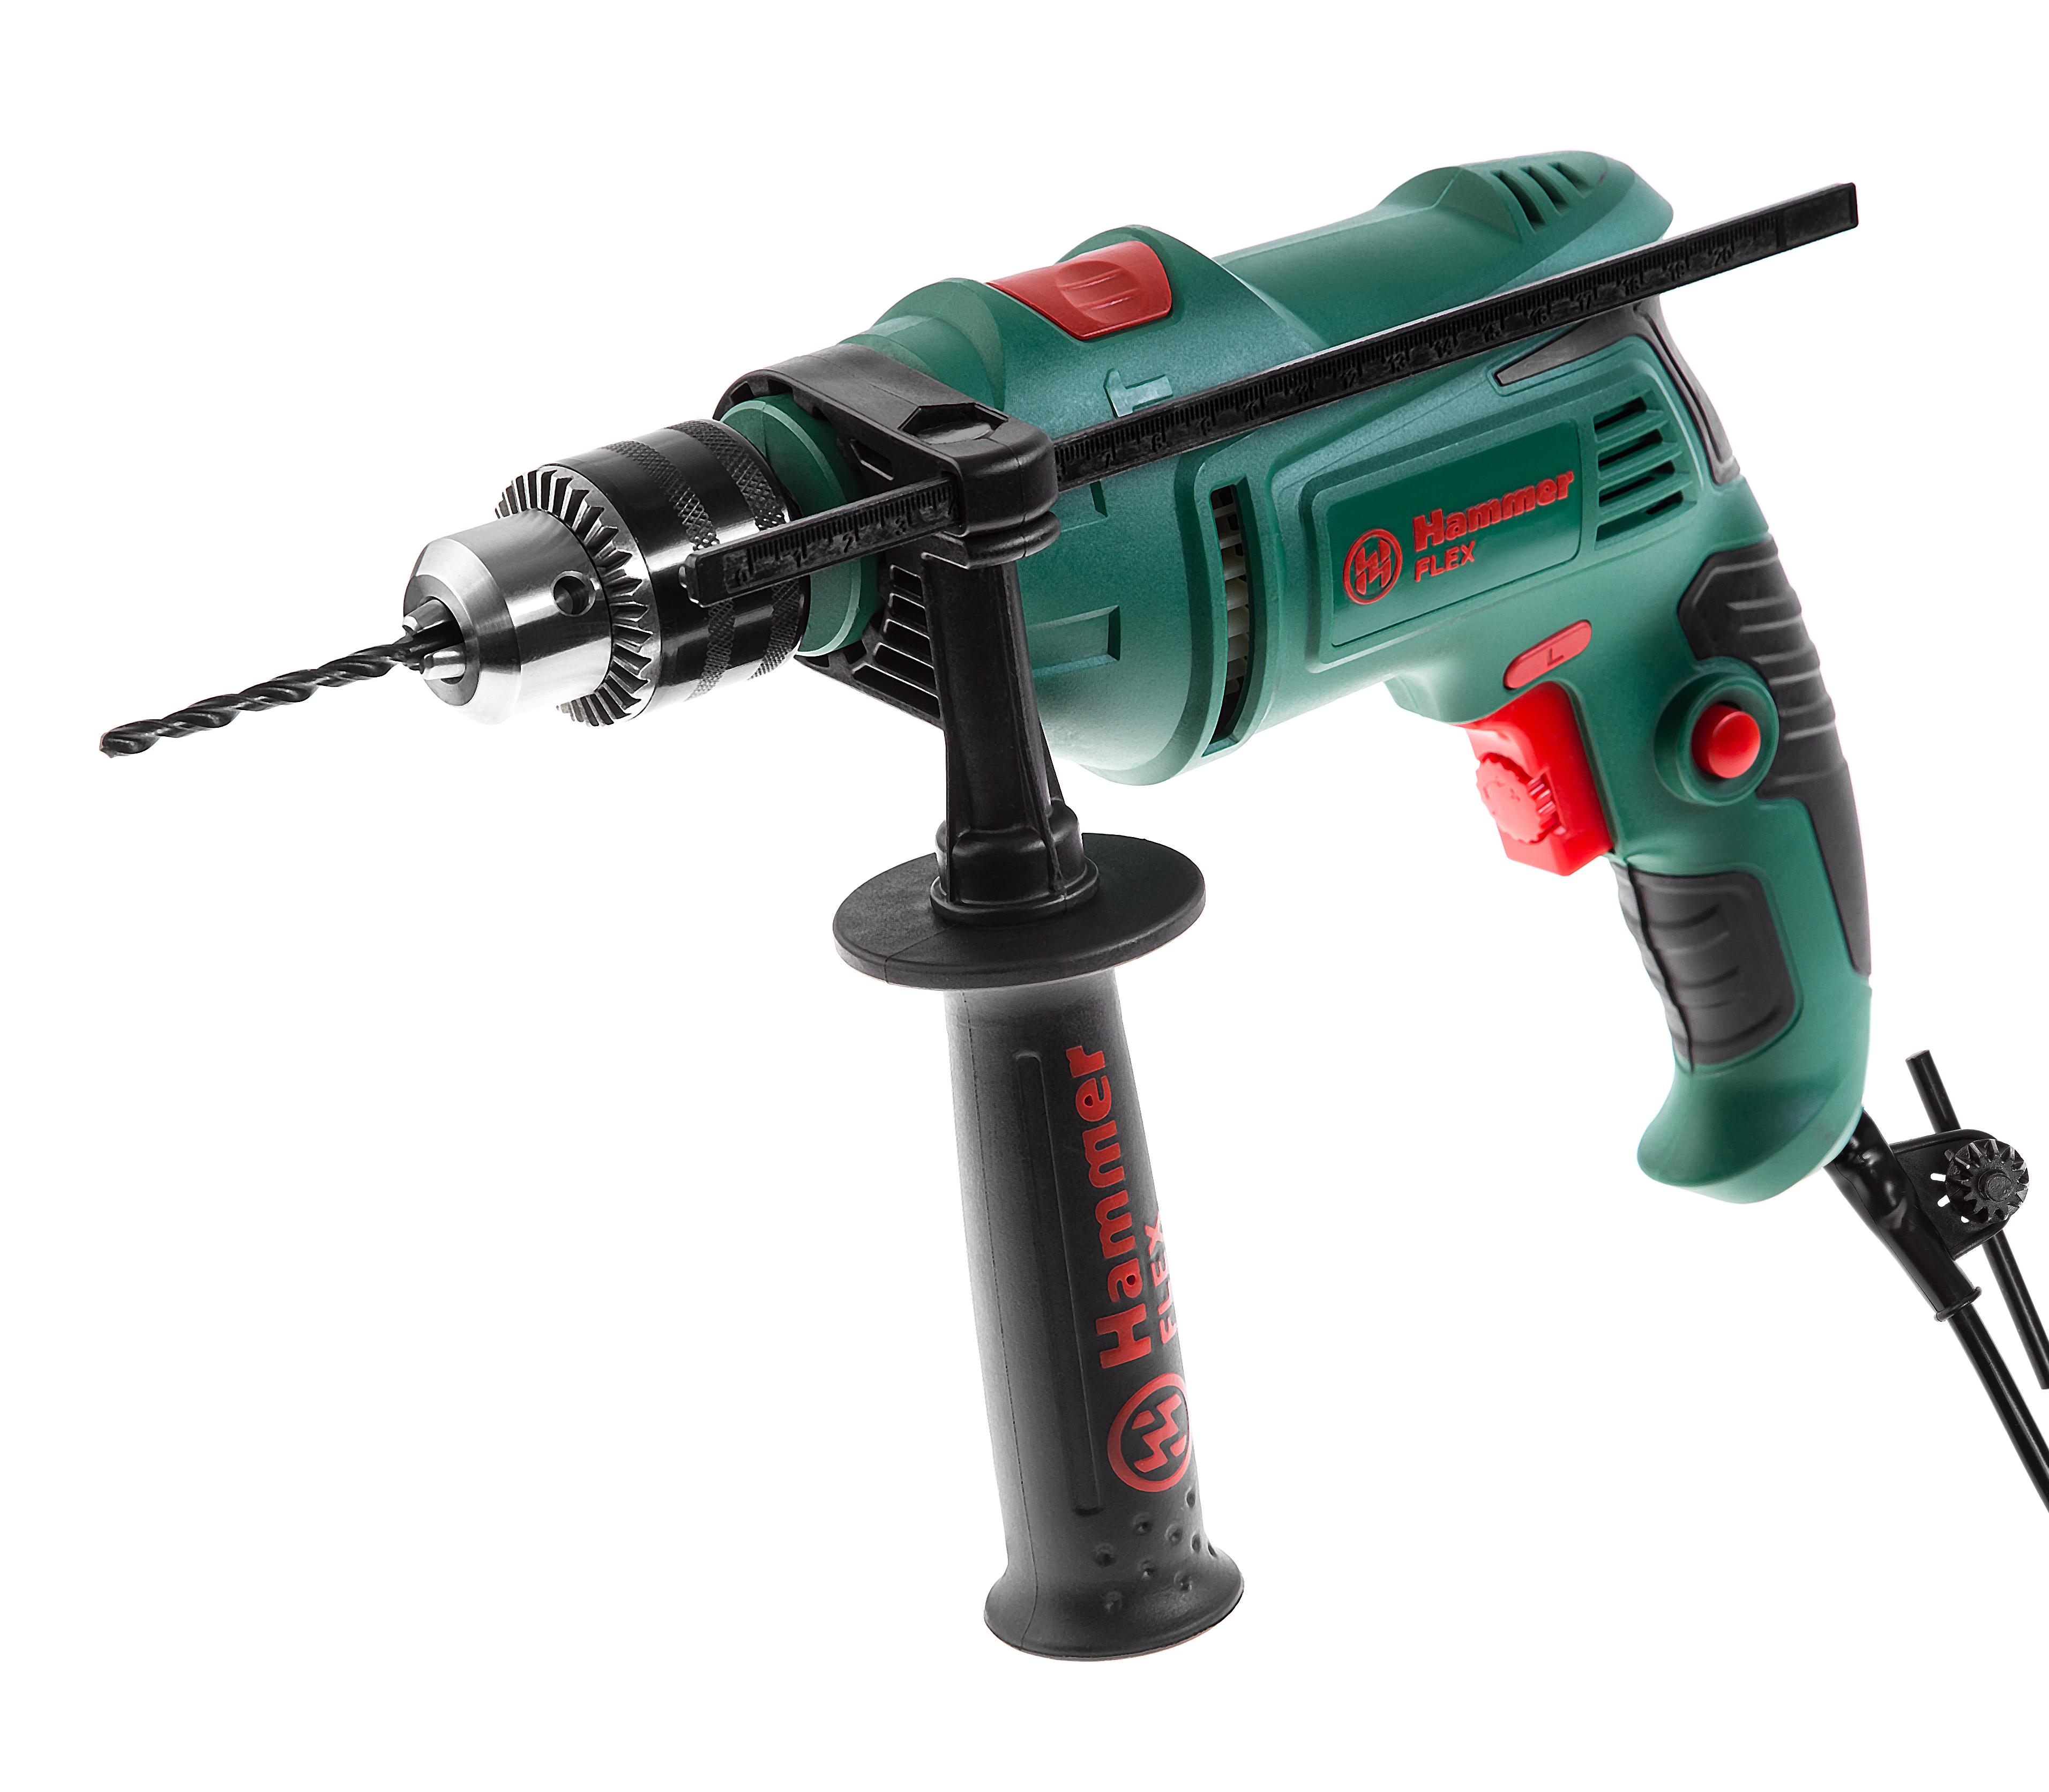 Дрель ударная Hammer Udd620d дрель ударная hammer udd1100a